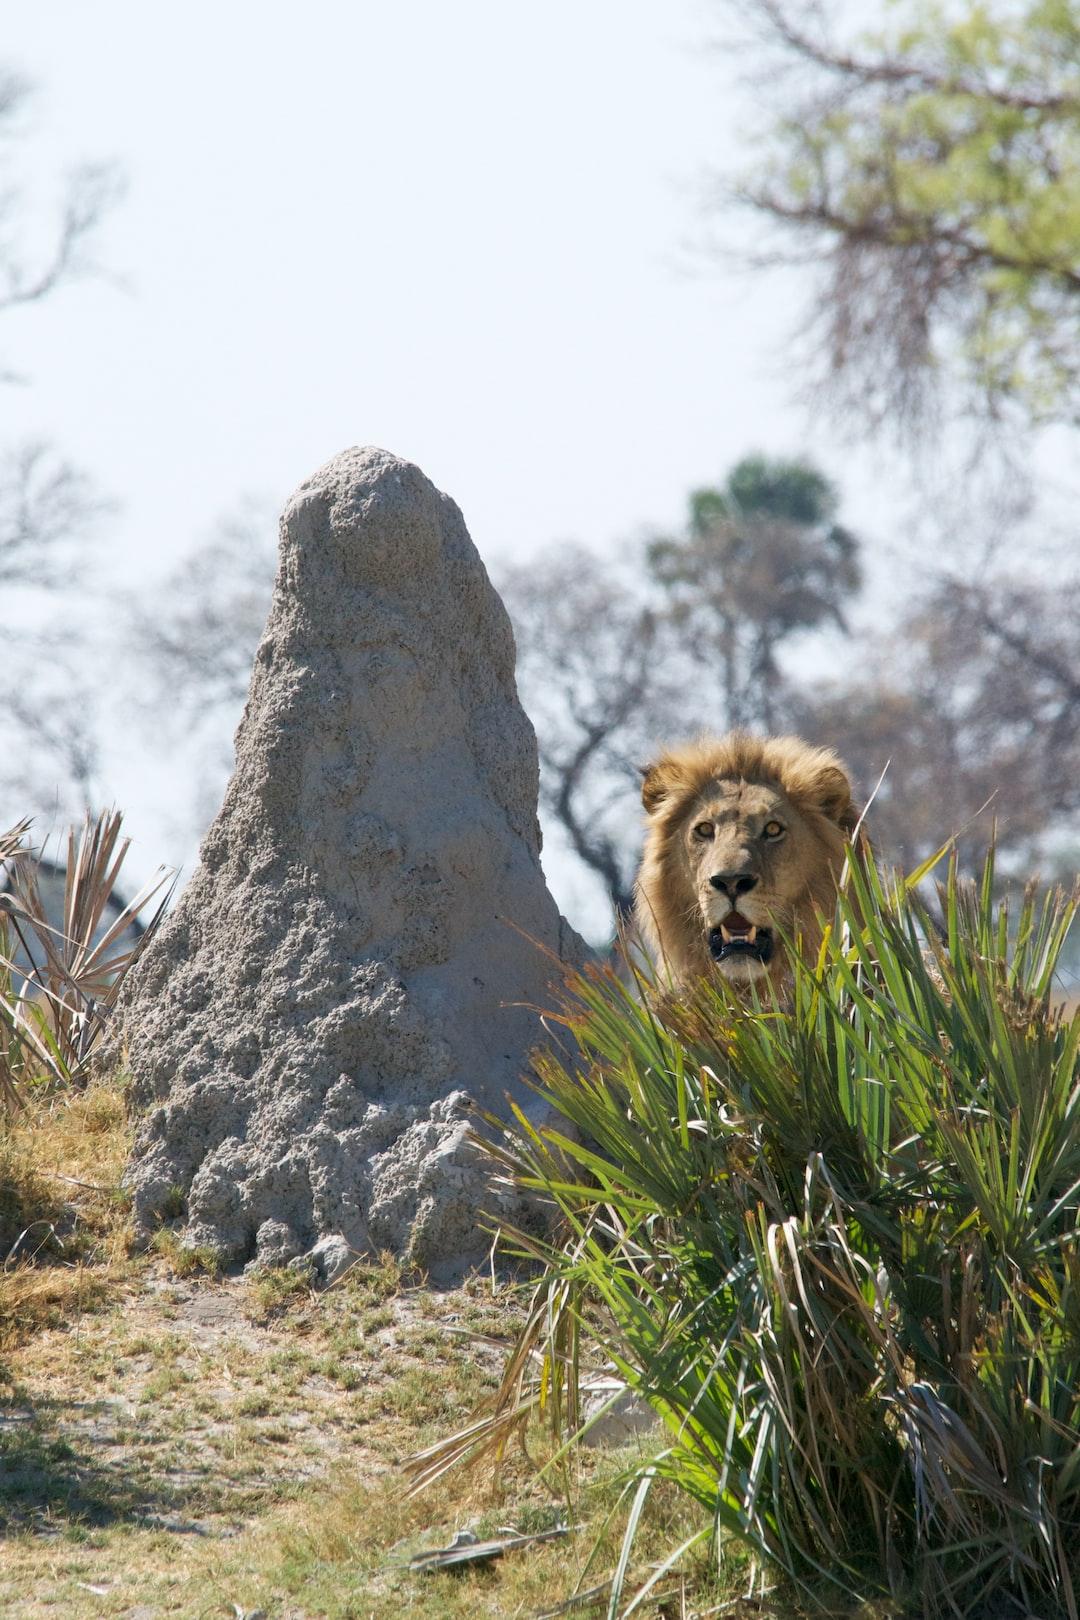 Golden mane behind the bush